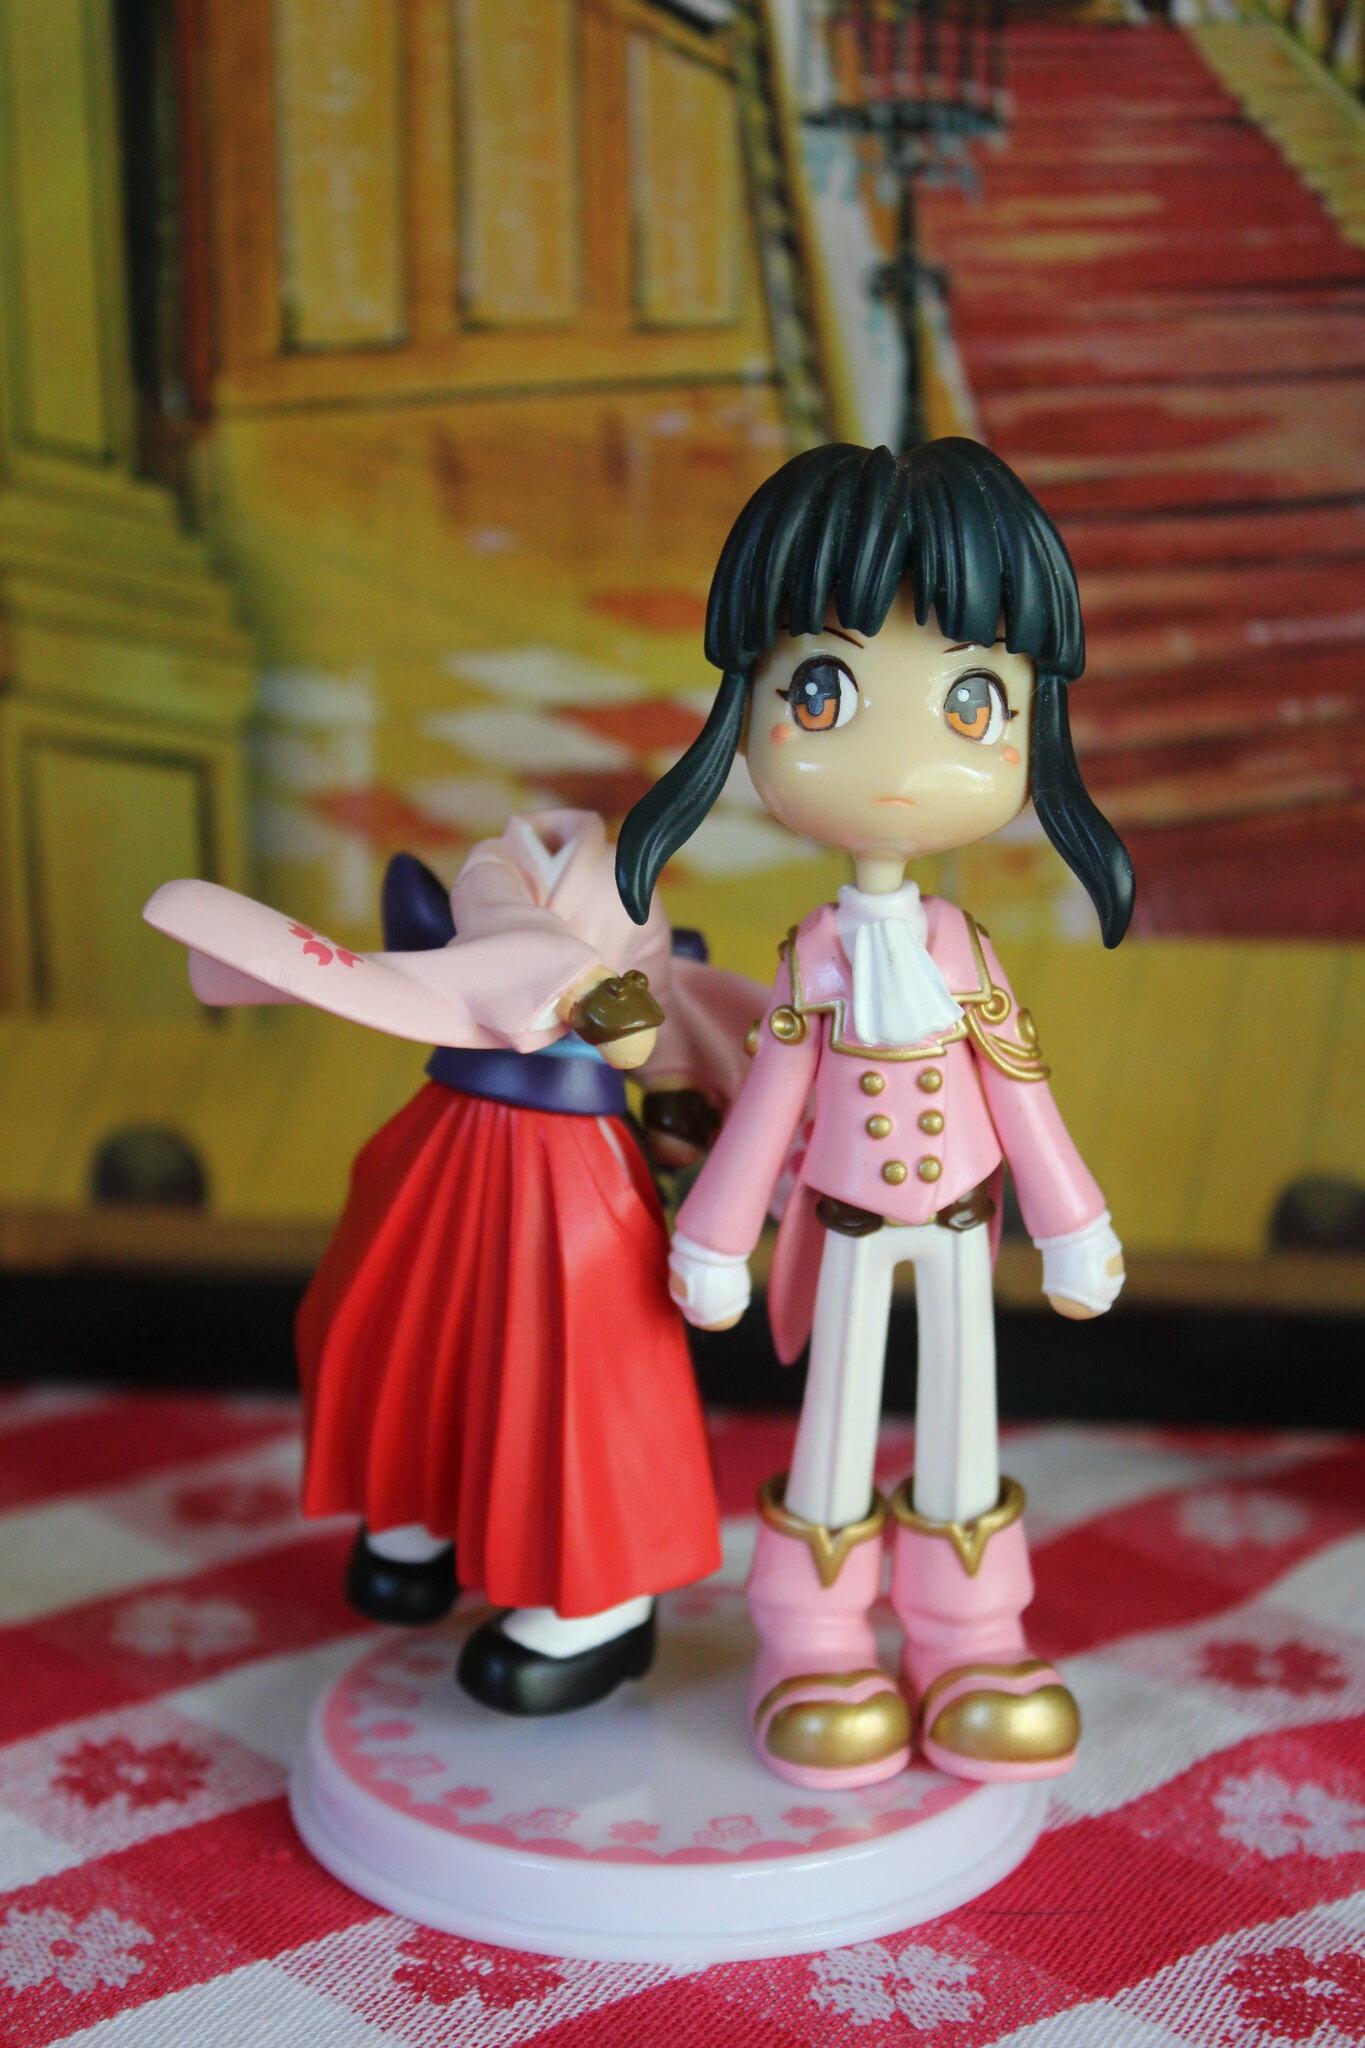 Pinky: ST